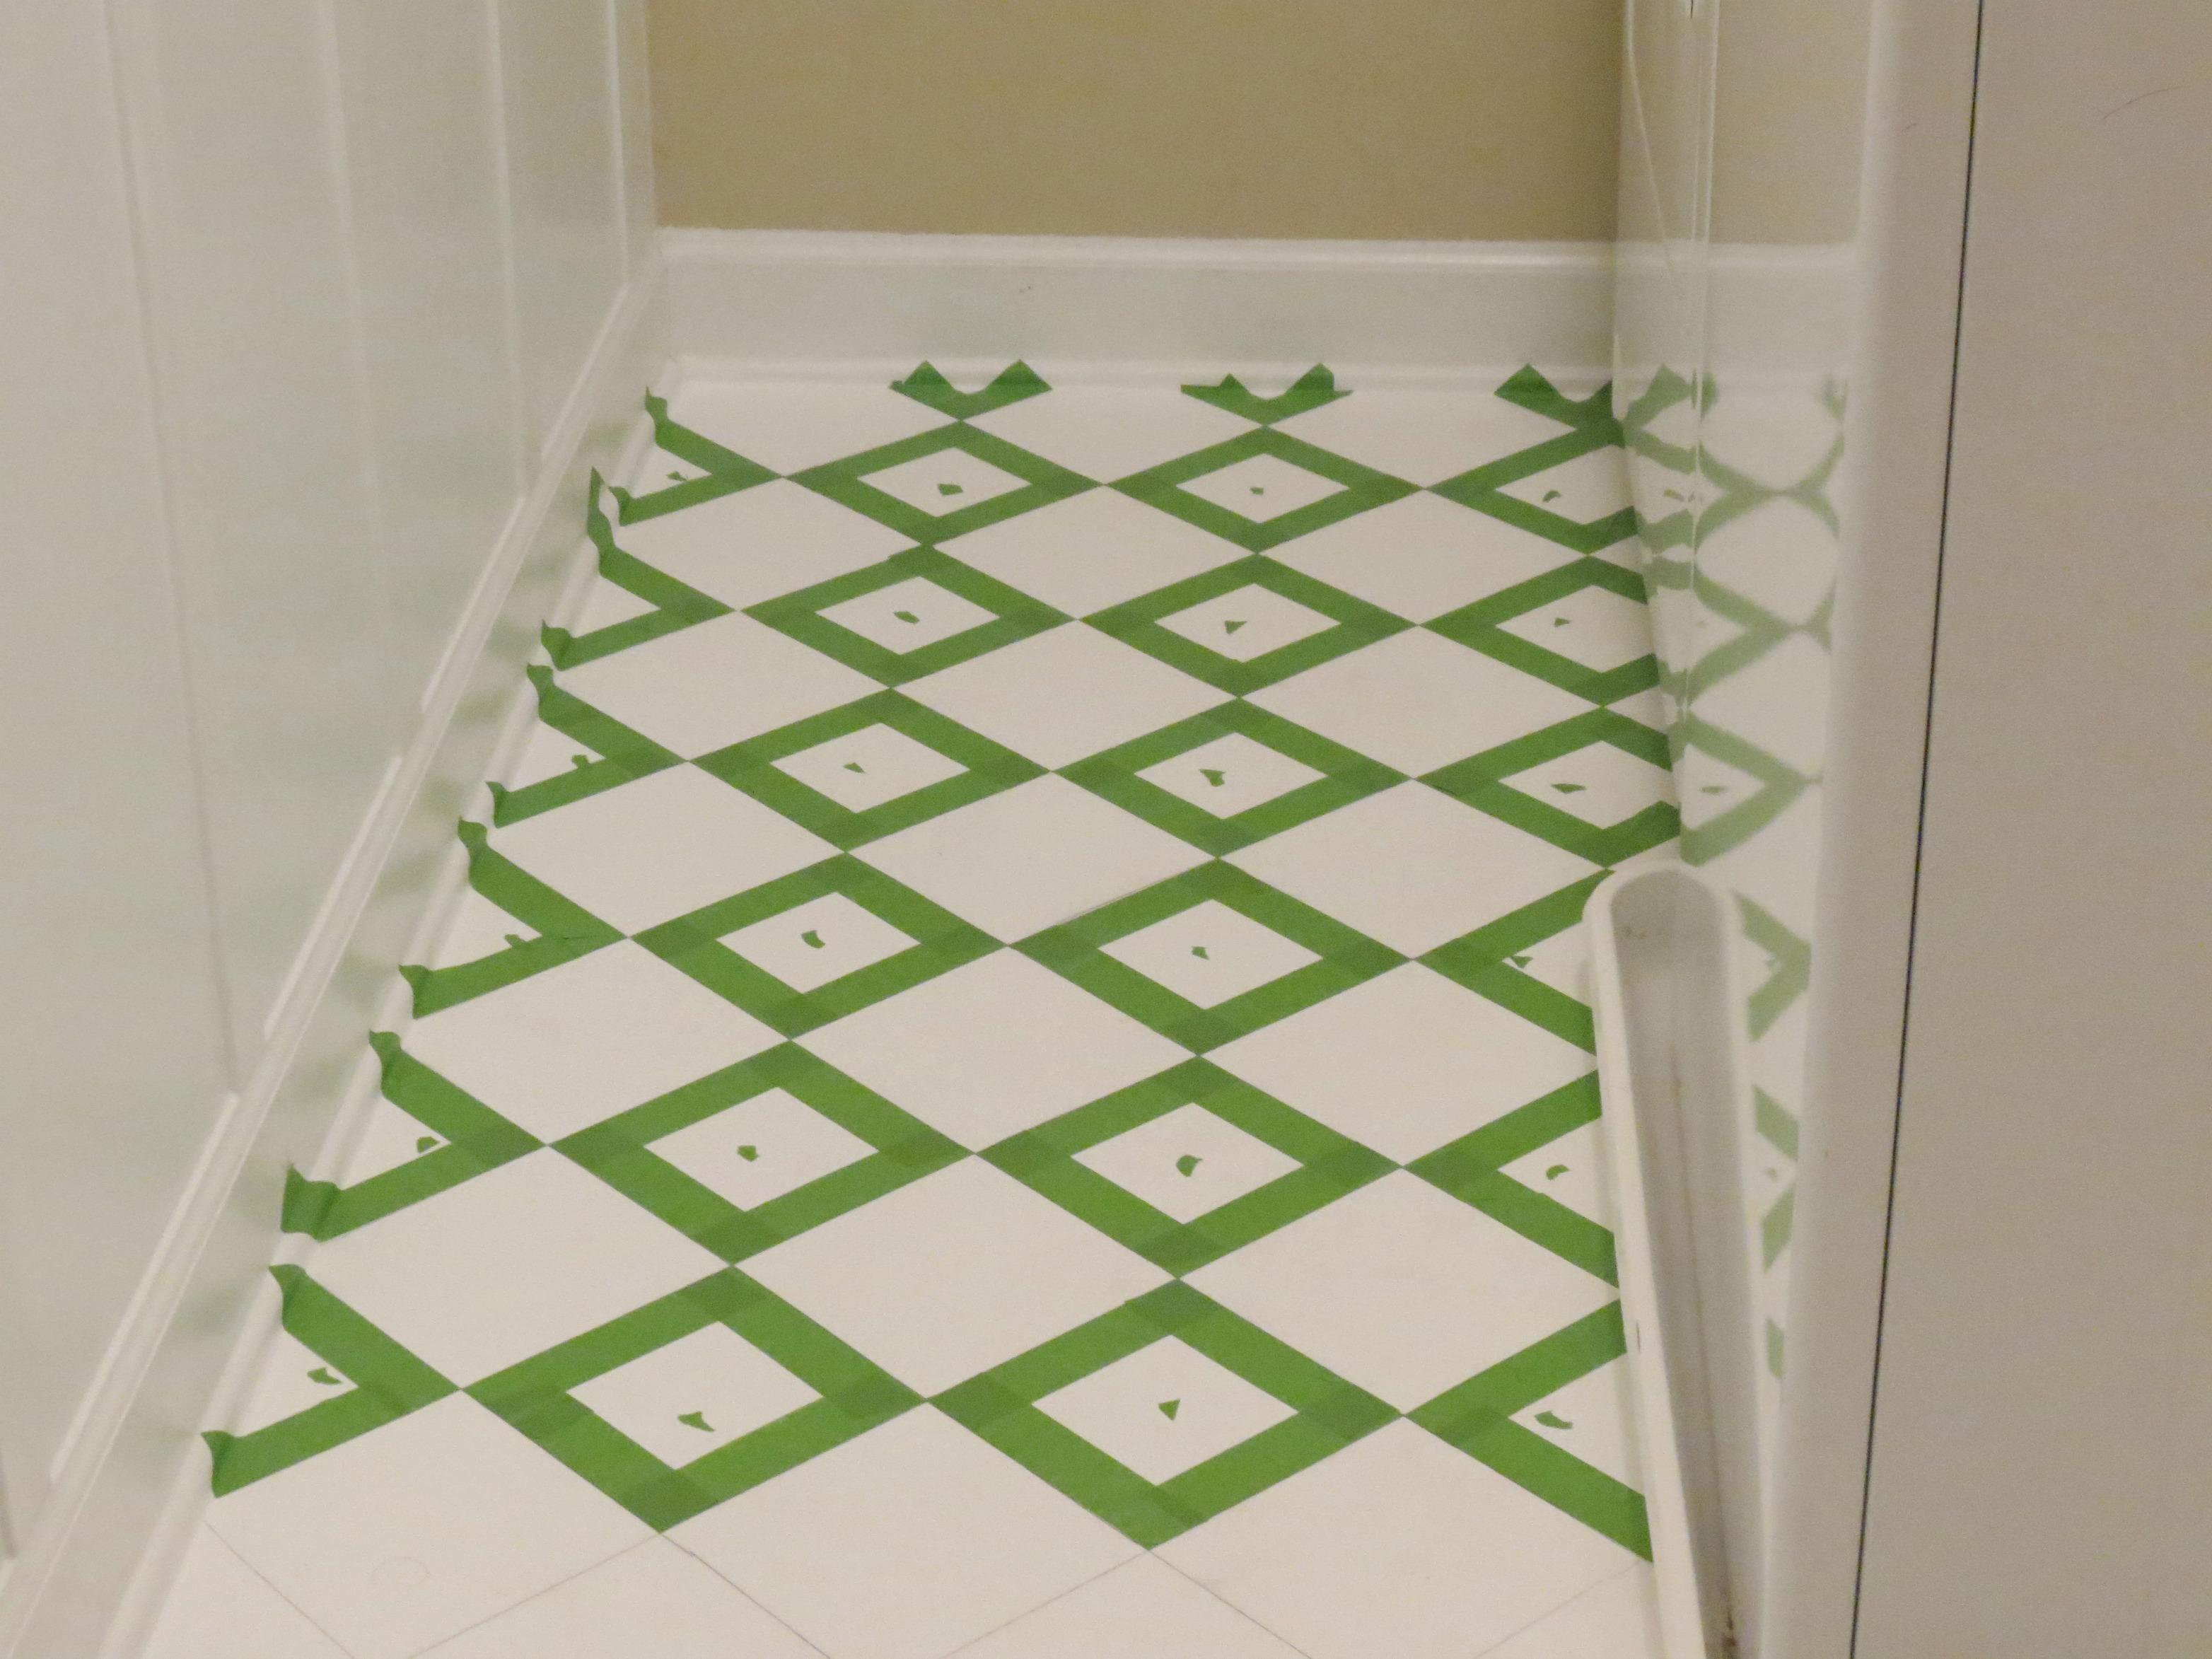 Painting Linoleum Kitchen Floor Painting Linoleum Floors Katinabagscom